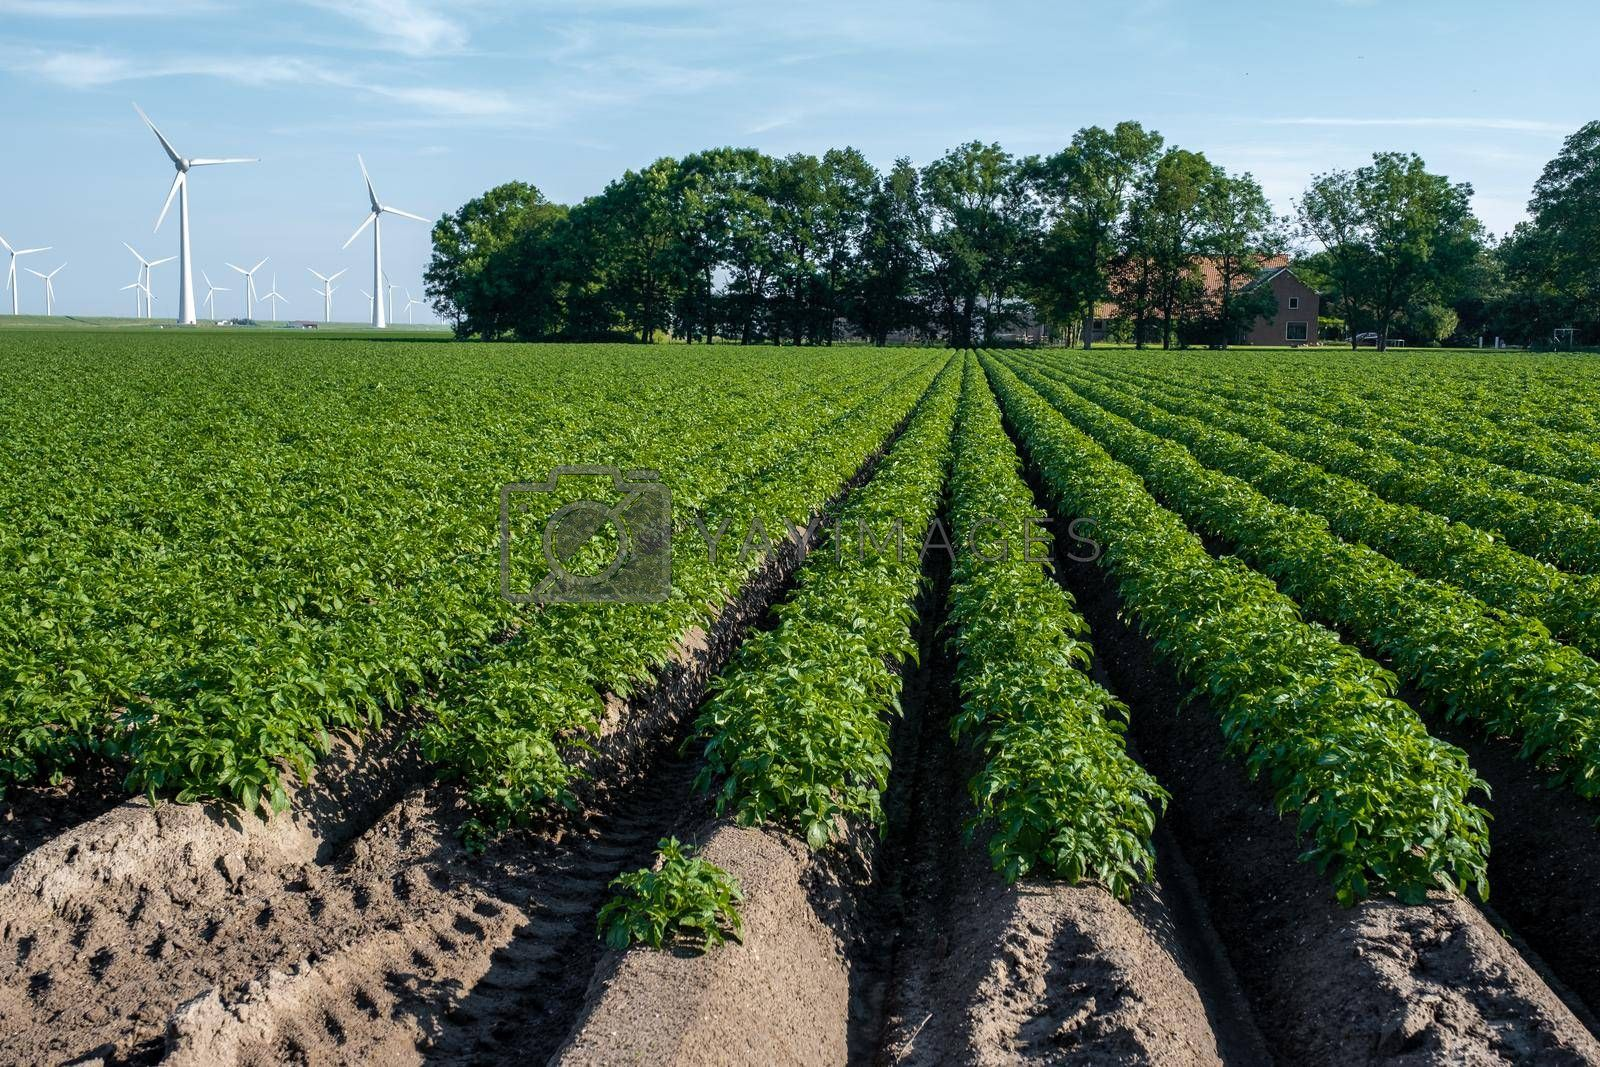 Green field of potato crops in a row Netherlands Flevoland Noordoostpolder